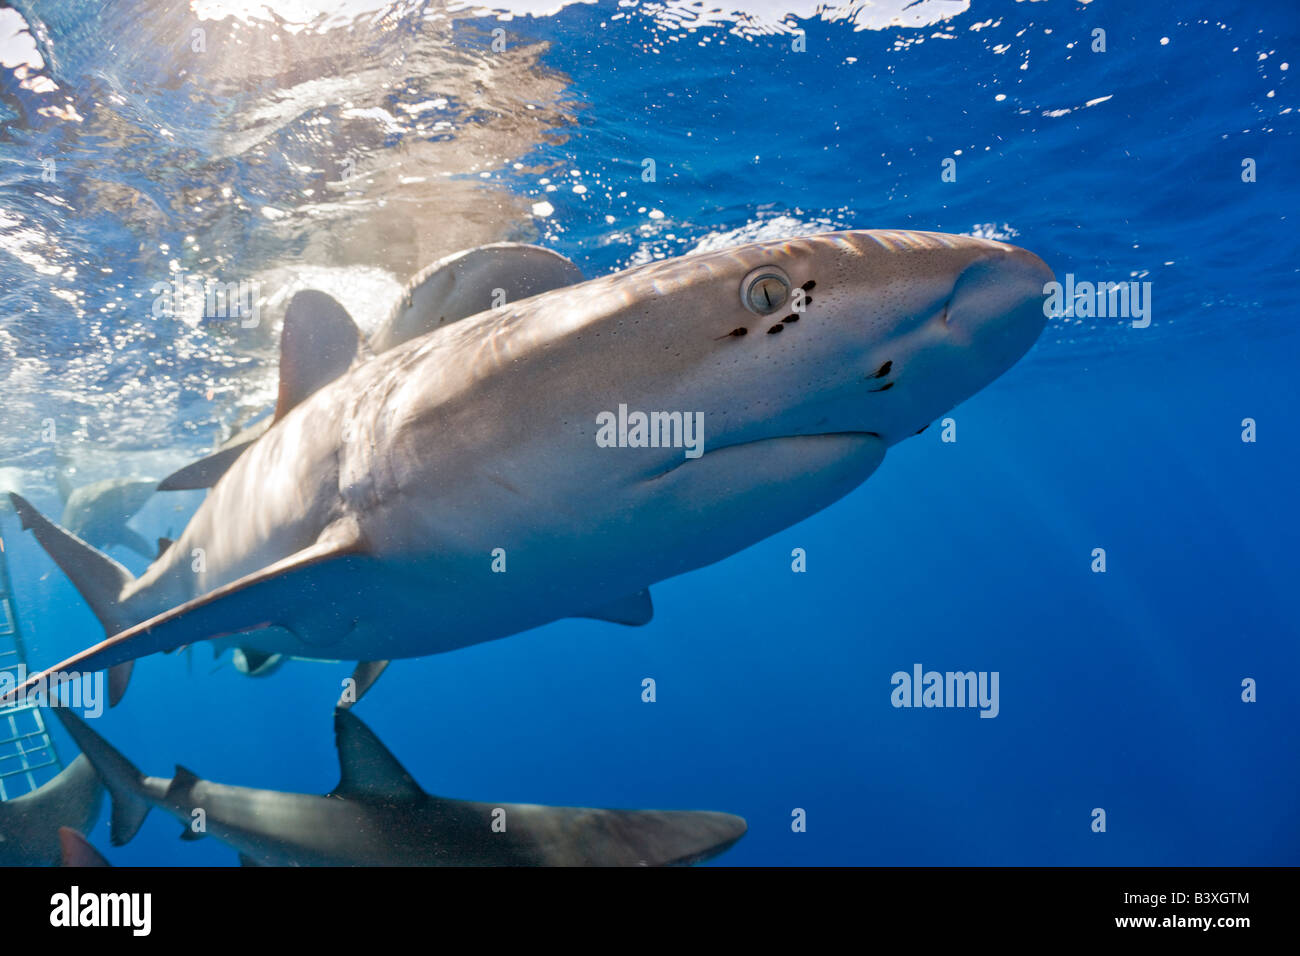 Galapagos Sharks Carcharhinus galapagensis Oahu Pacific Ocean Hawaii USA - Stock Image